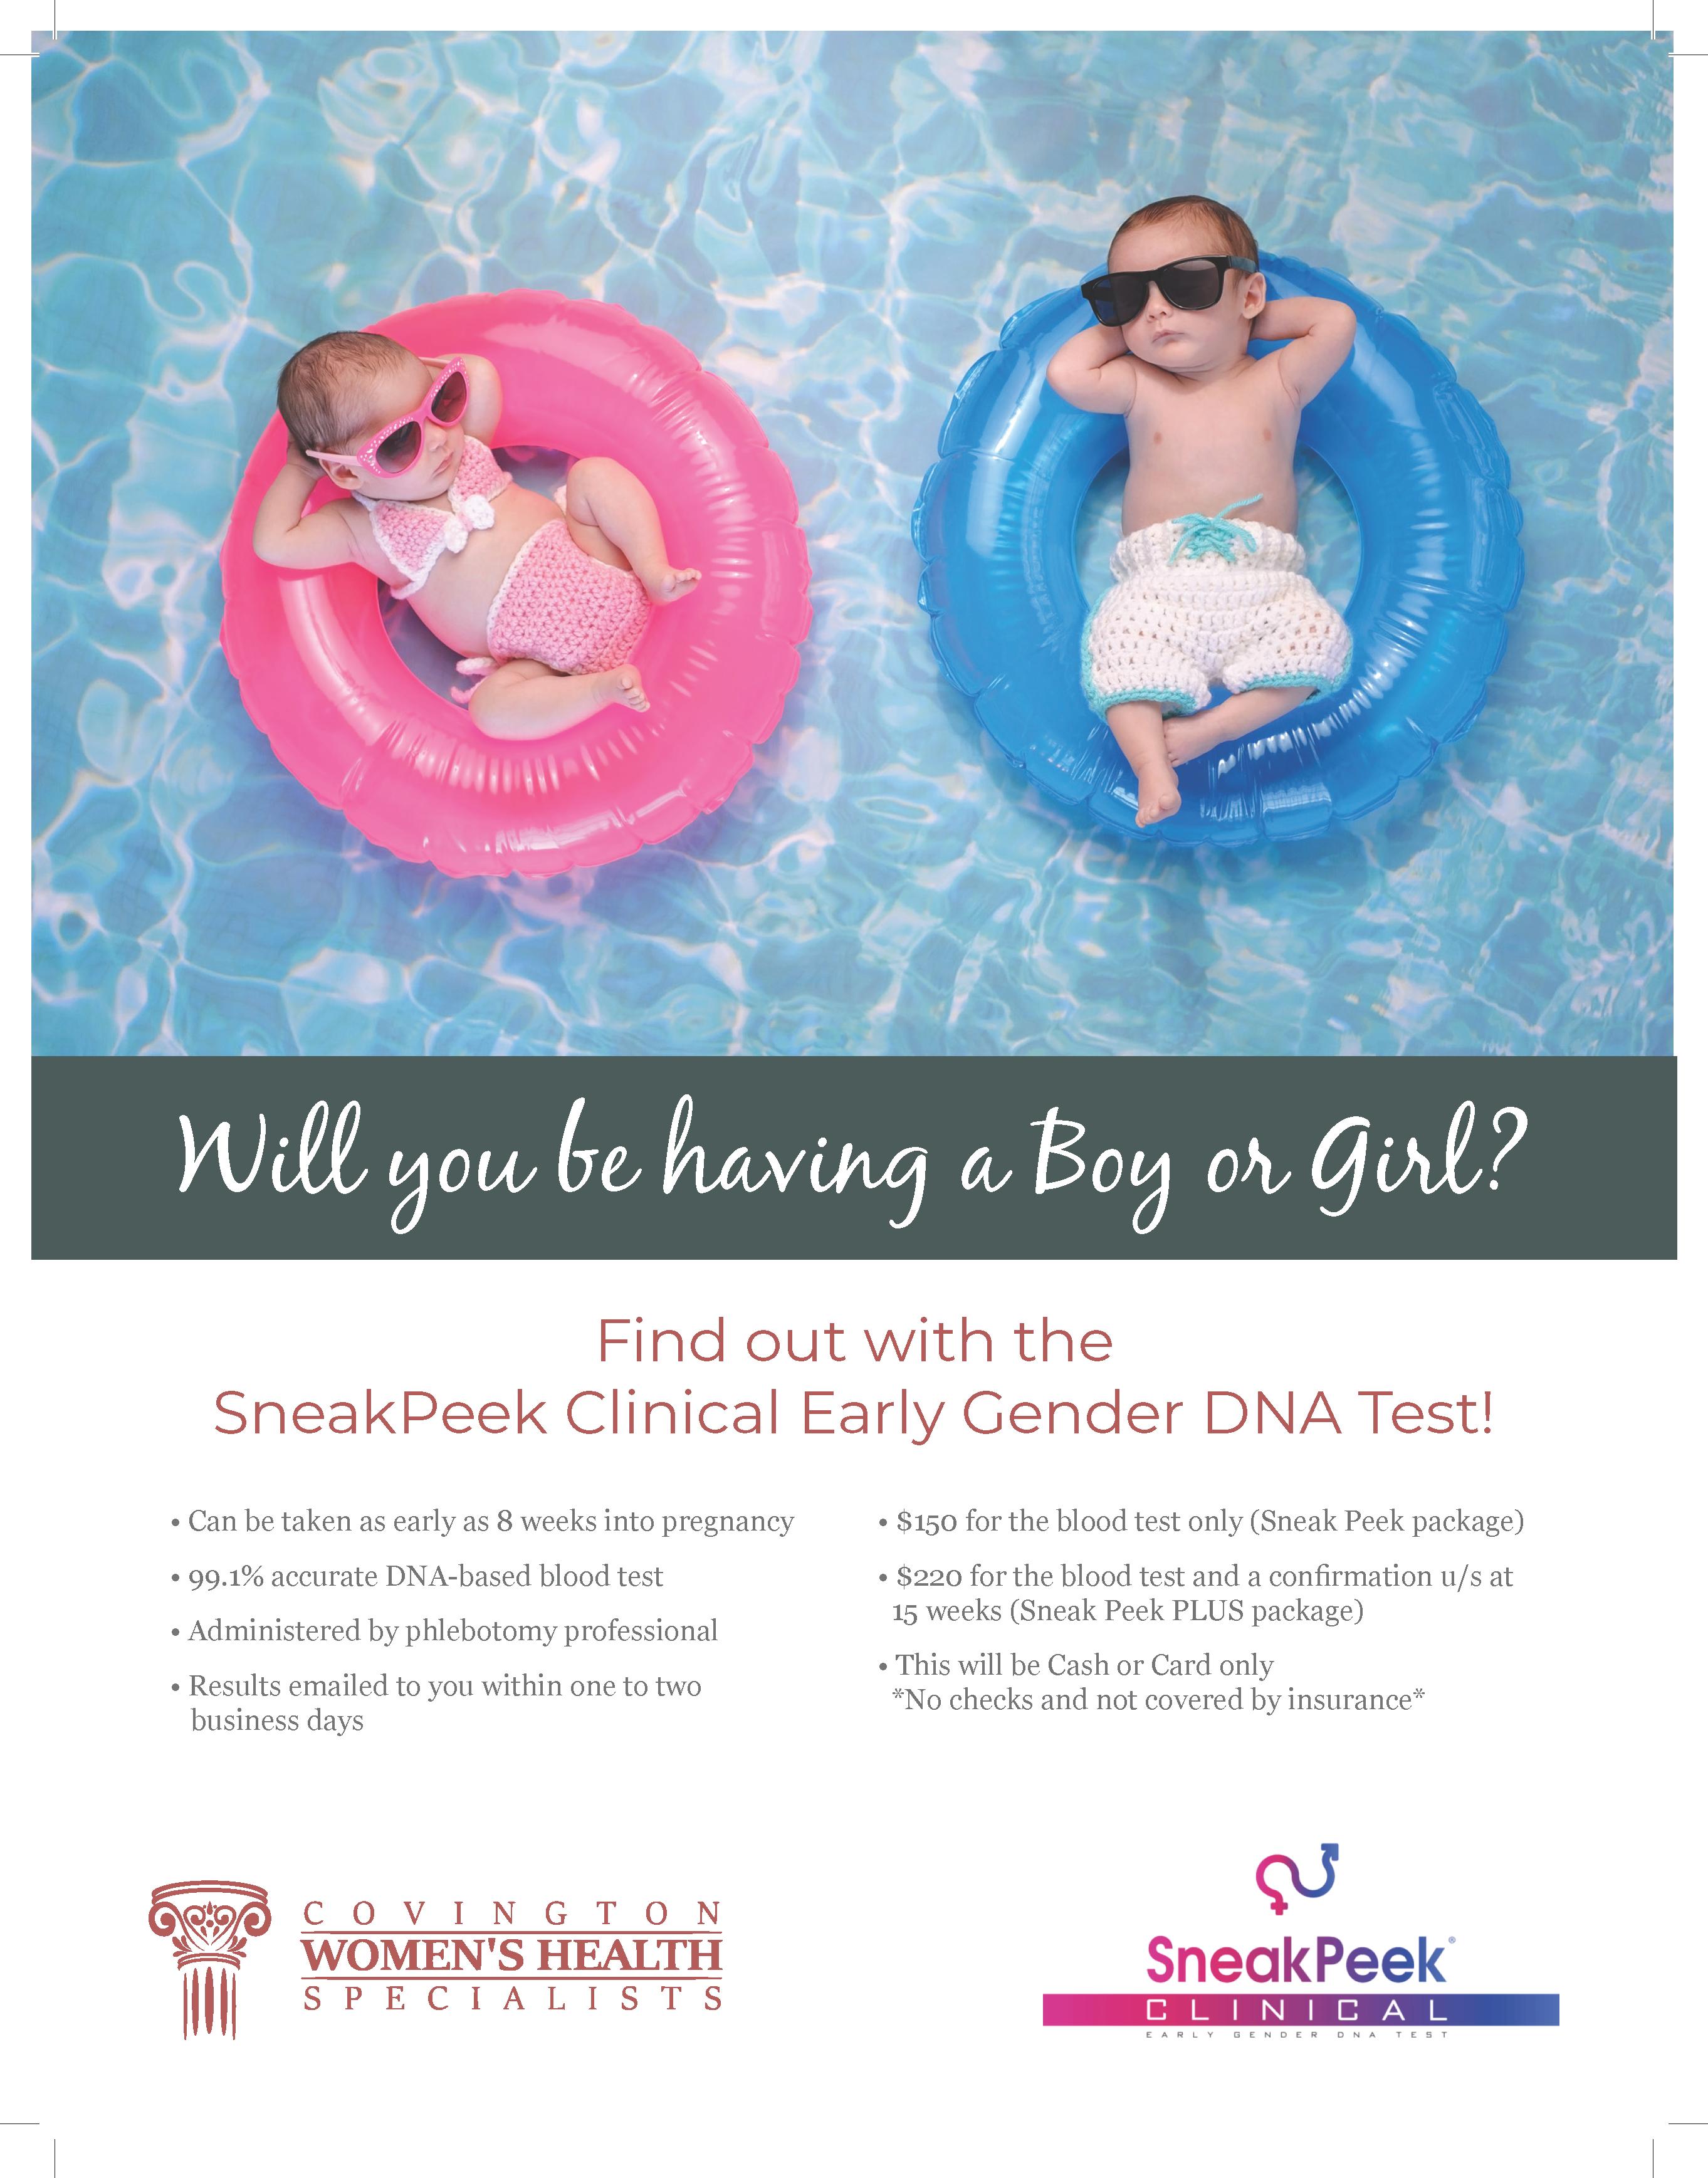 Flyer two of Covington Women's Health gender reveal service.